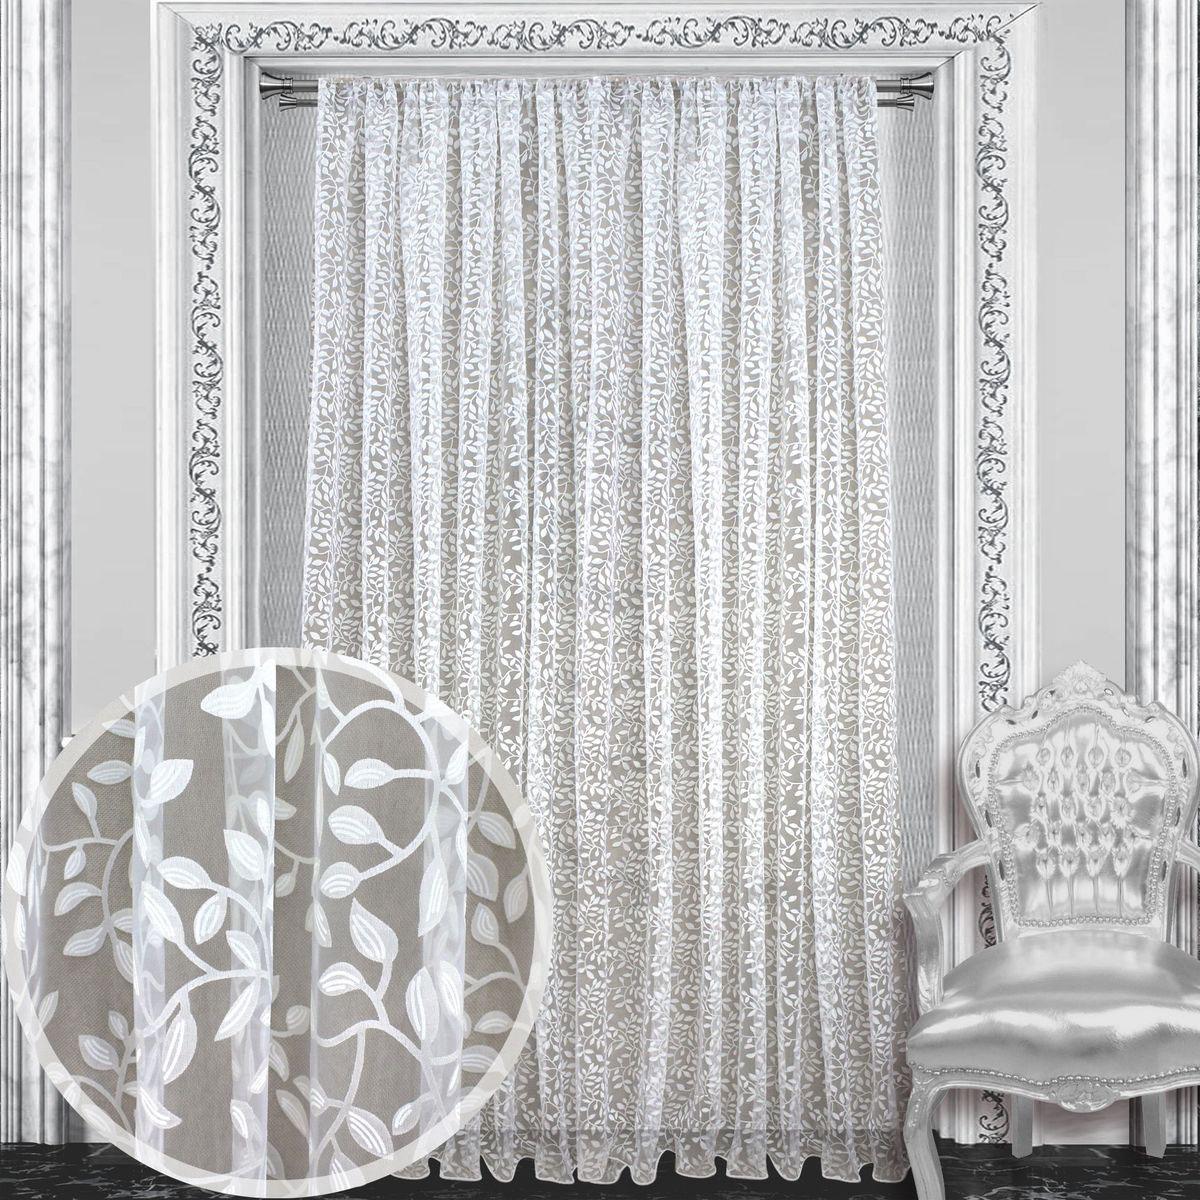 Тюль Amore Mio, 300 х 270 см, 1 шт., цвет: белый. 8611586115